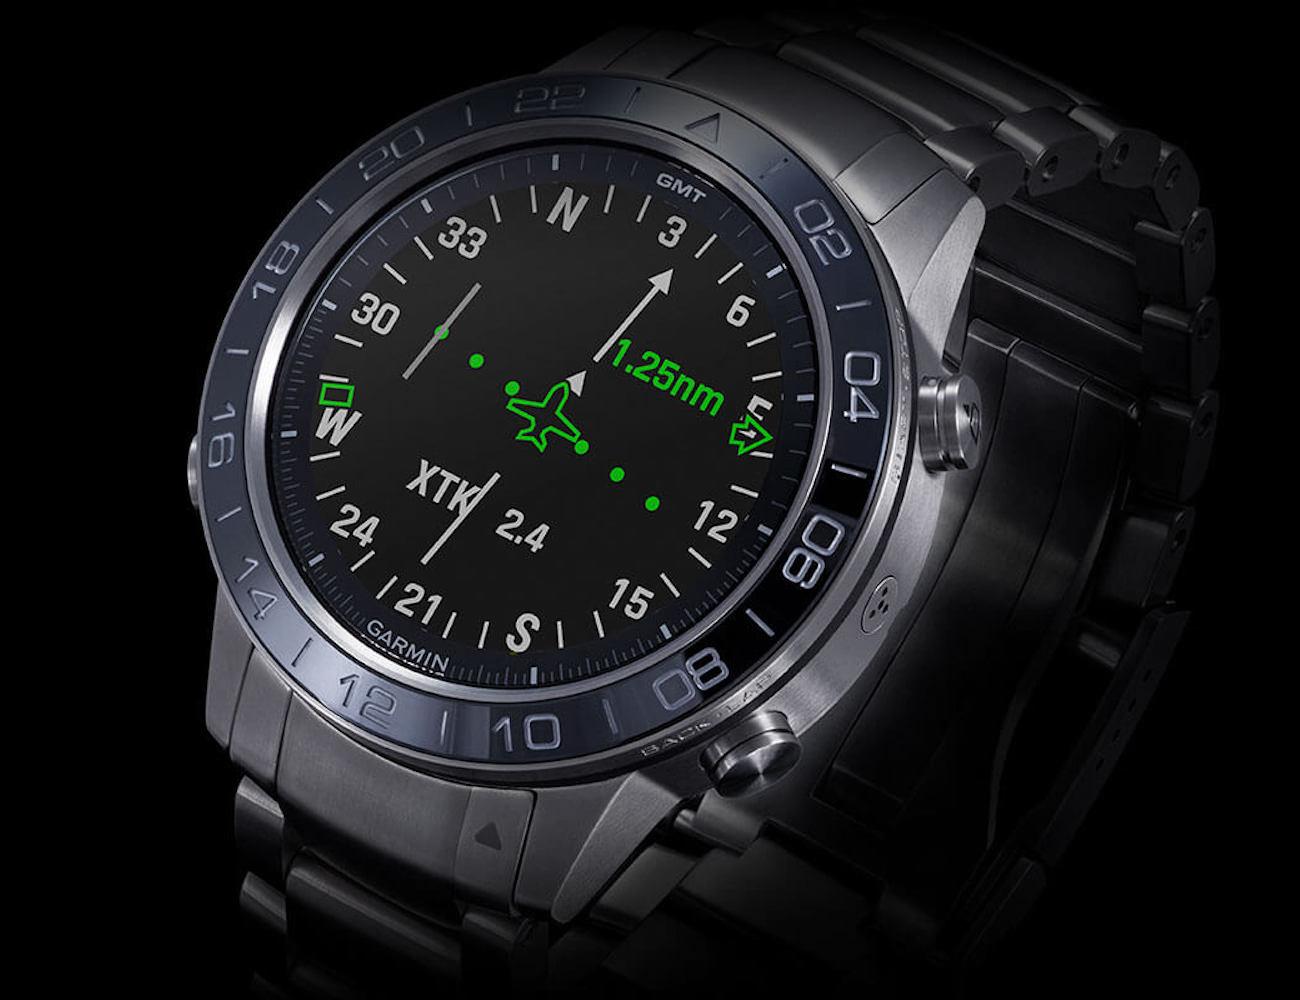 Garmin MARQ Aviator Modern Tool Smartwatch helps you fly confidently